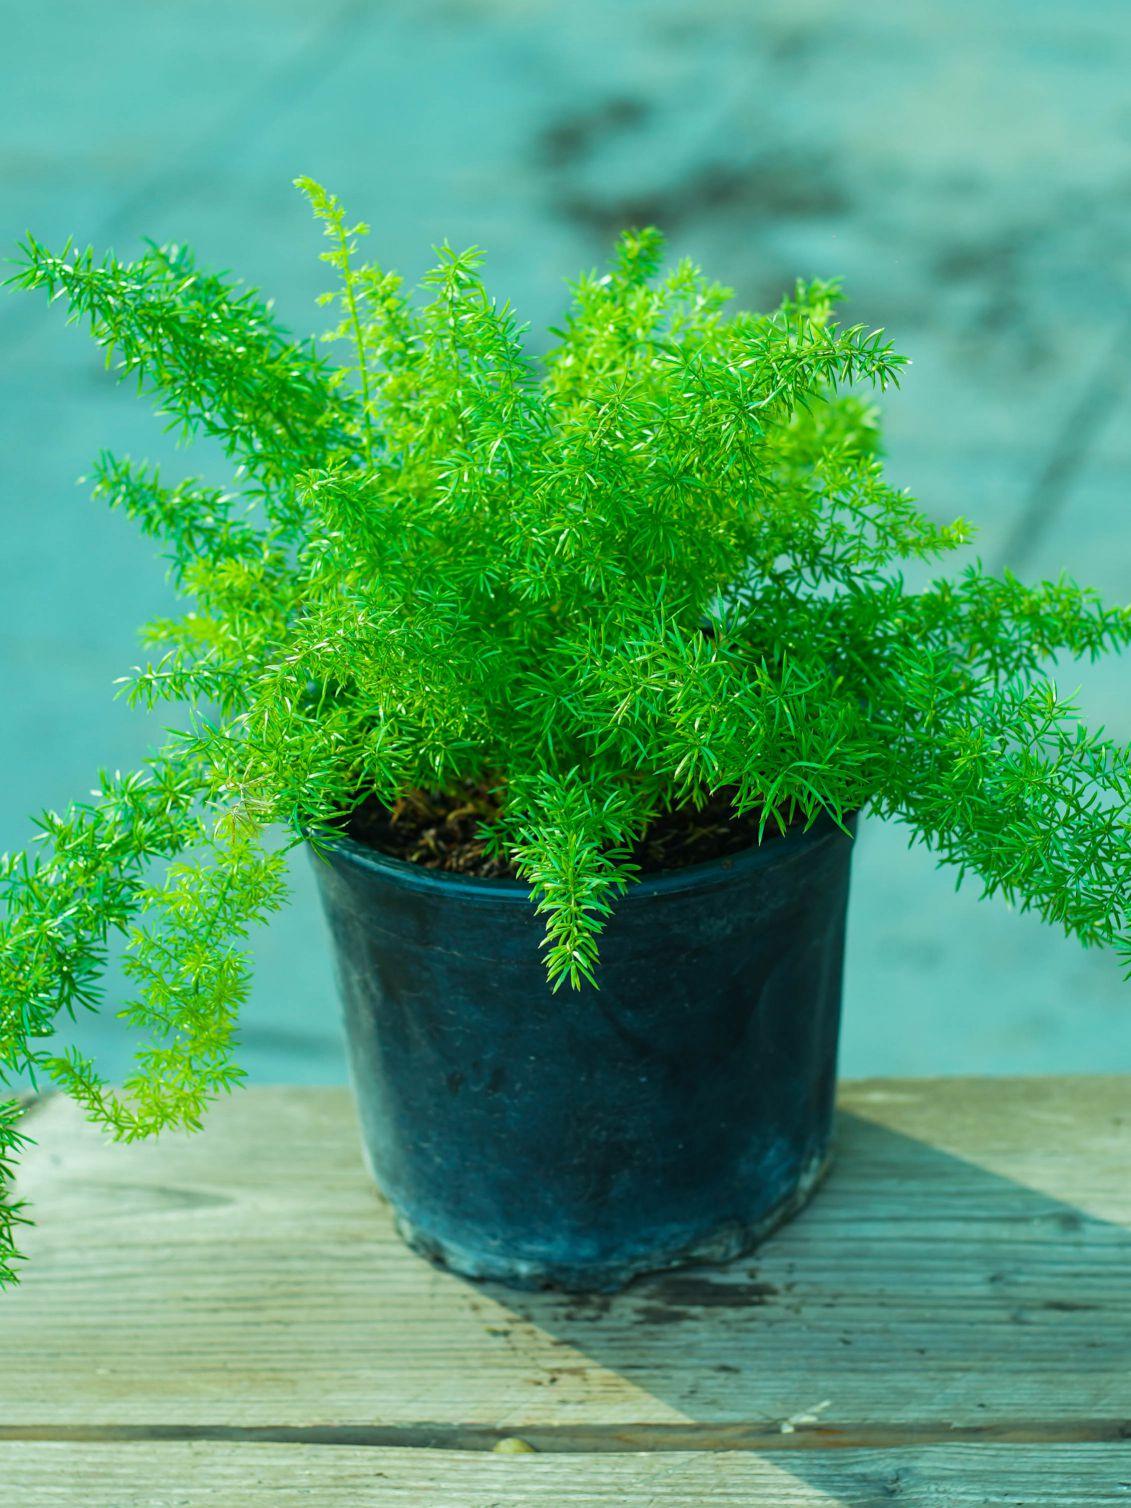 اسبراجوس الليوم نباتات خارجية شجيرات